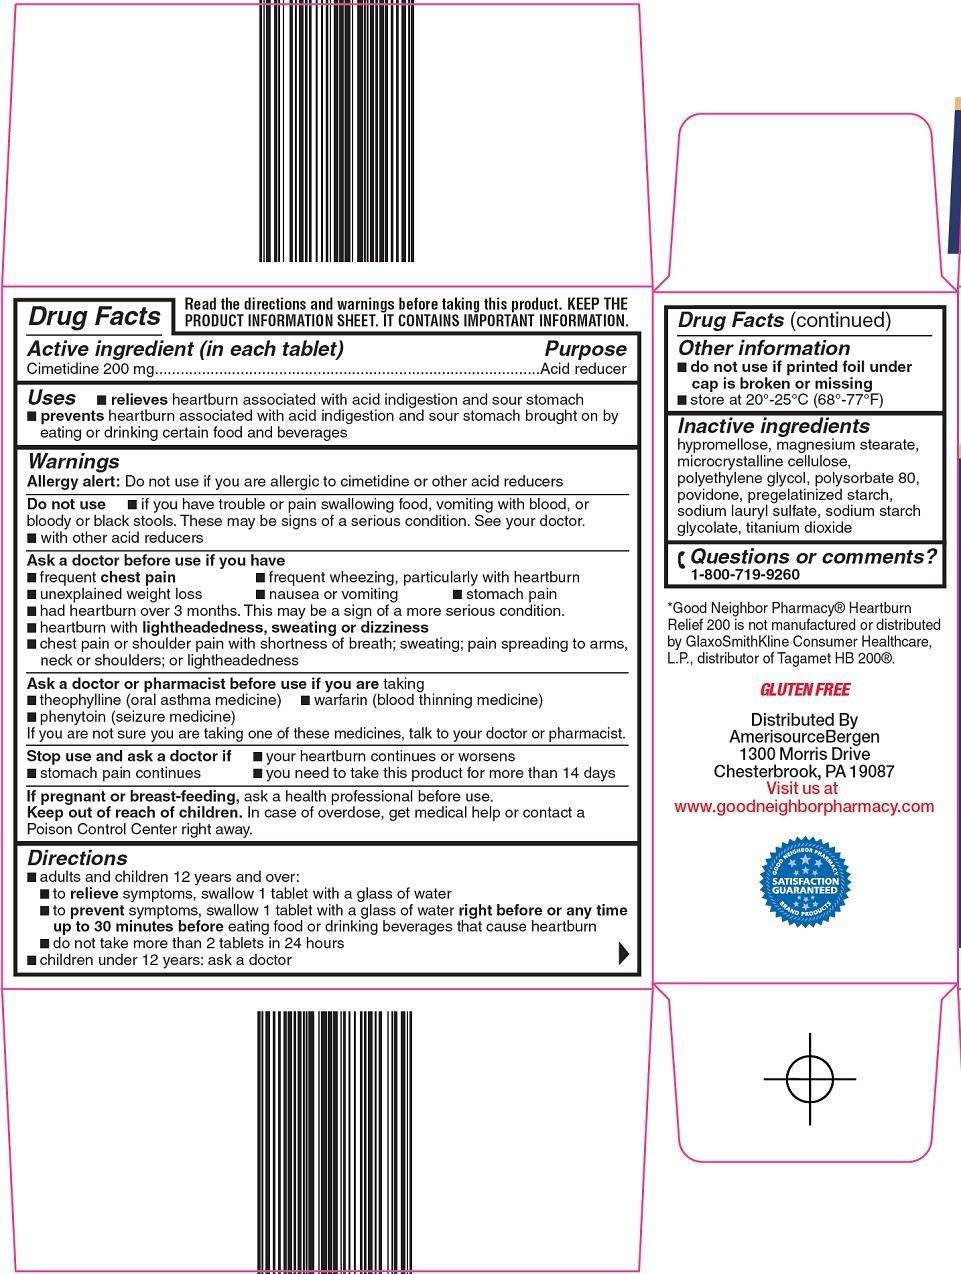 Heartburn Relief 200 Carton Image 2